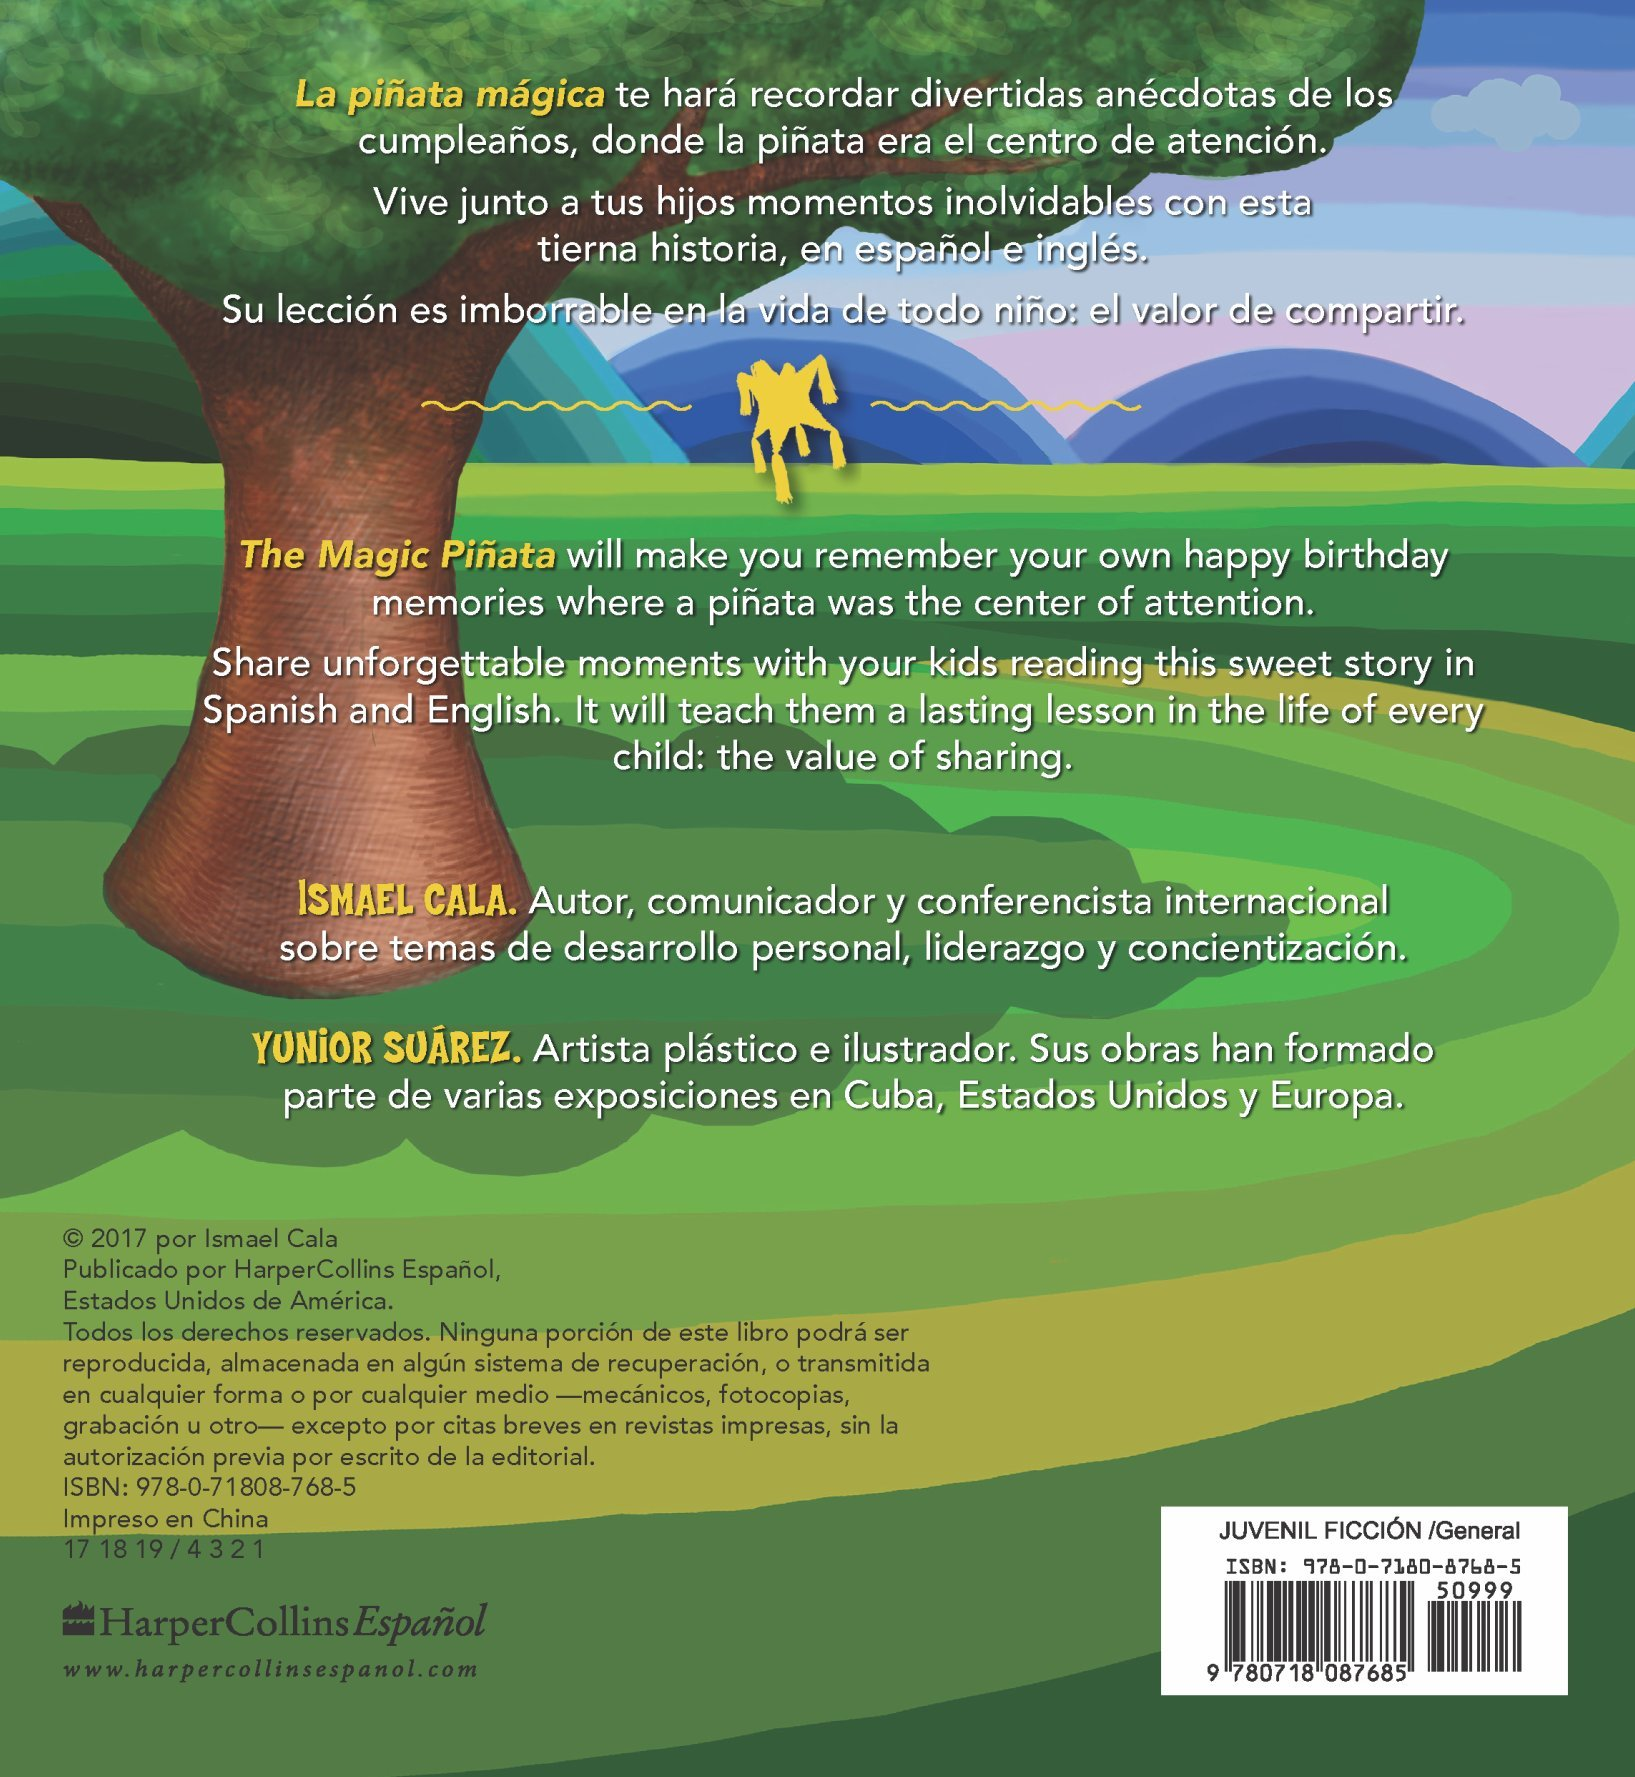 La piñata mágica - Bilingüe (Spanish Edition): Ismael Cala: 9780718087685: Amazon.com: Books